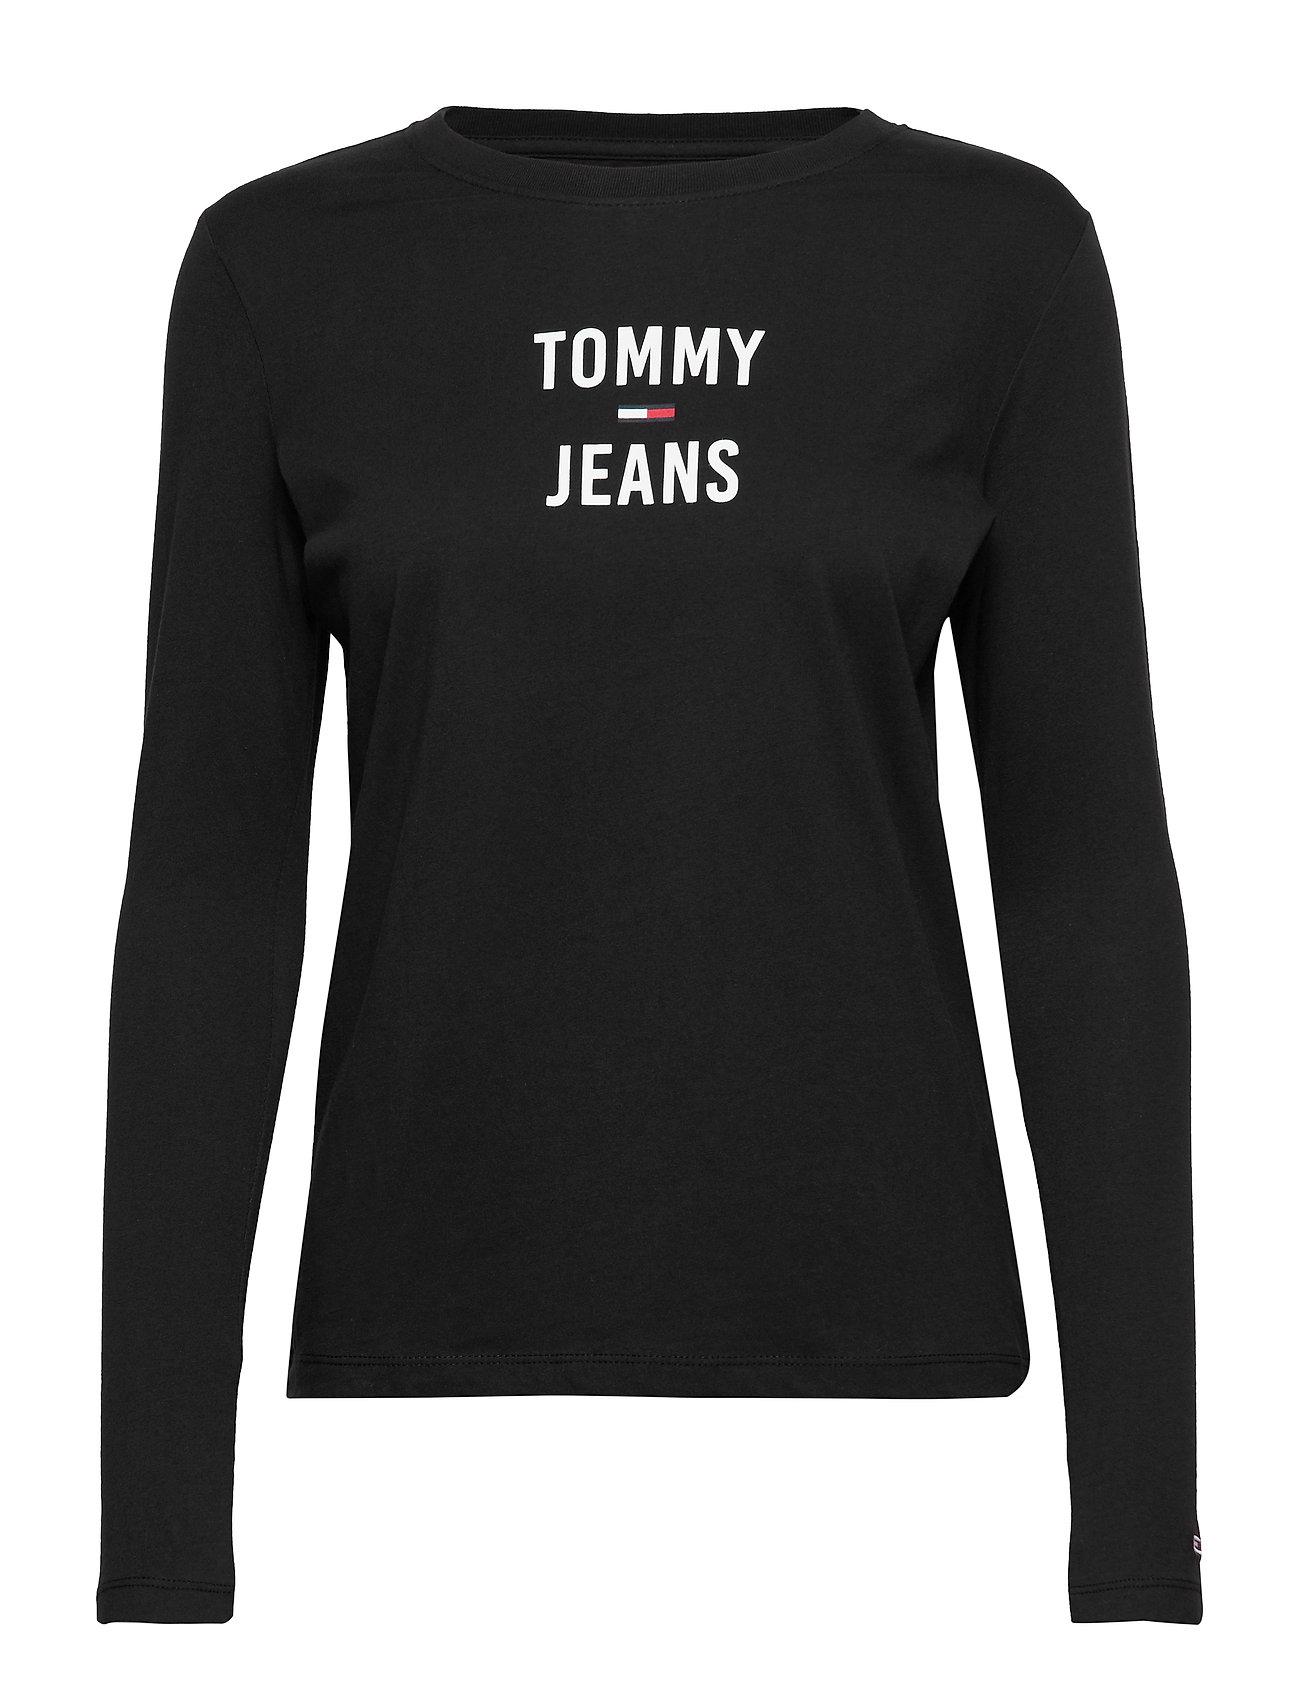 Tommy Jeans TJW SQUARE LOGO LONG - TOMMY BLACK